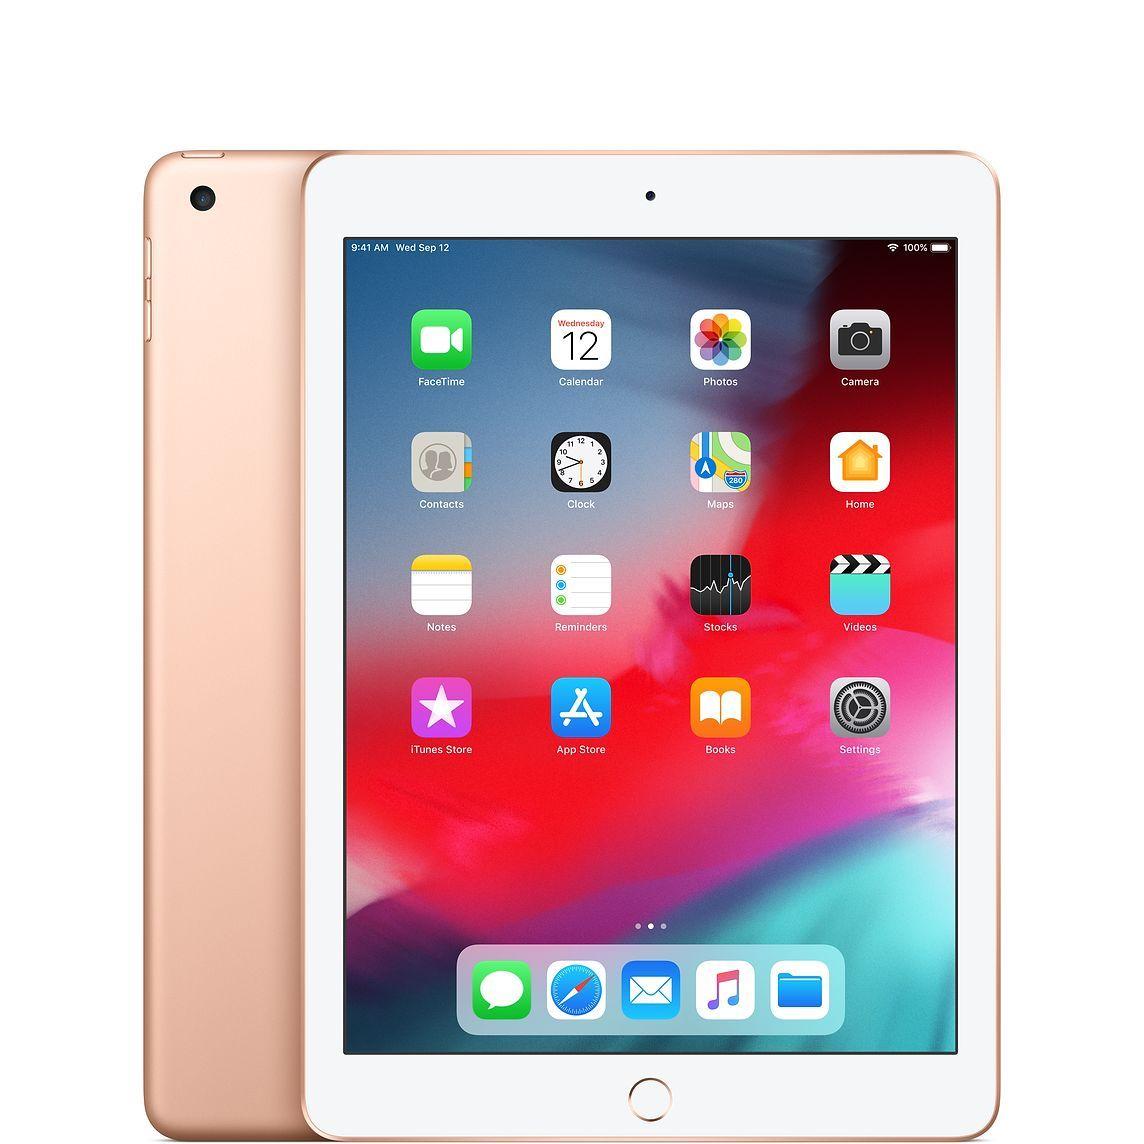 Refurbished Ipad Wi Fi 128gb Gold 6th Generation Apple Ipad New Apple Ipad Refurbished Ipad